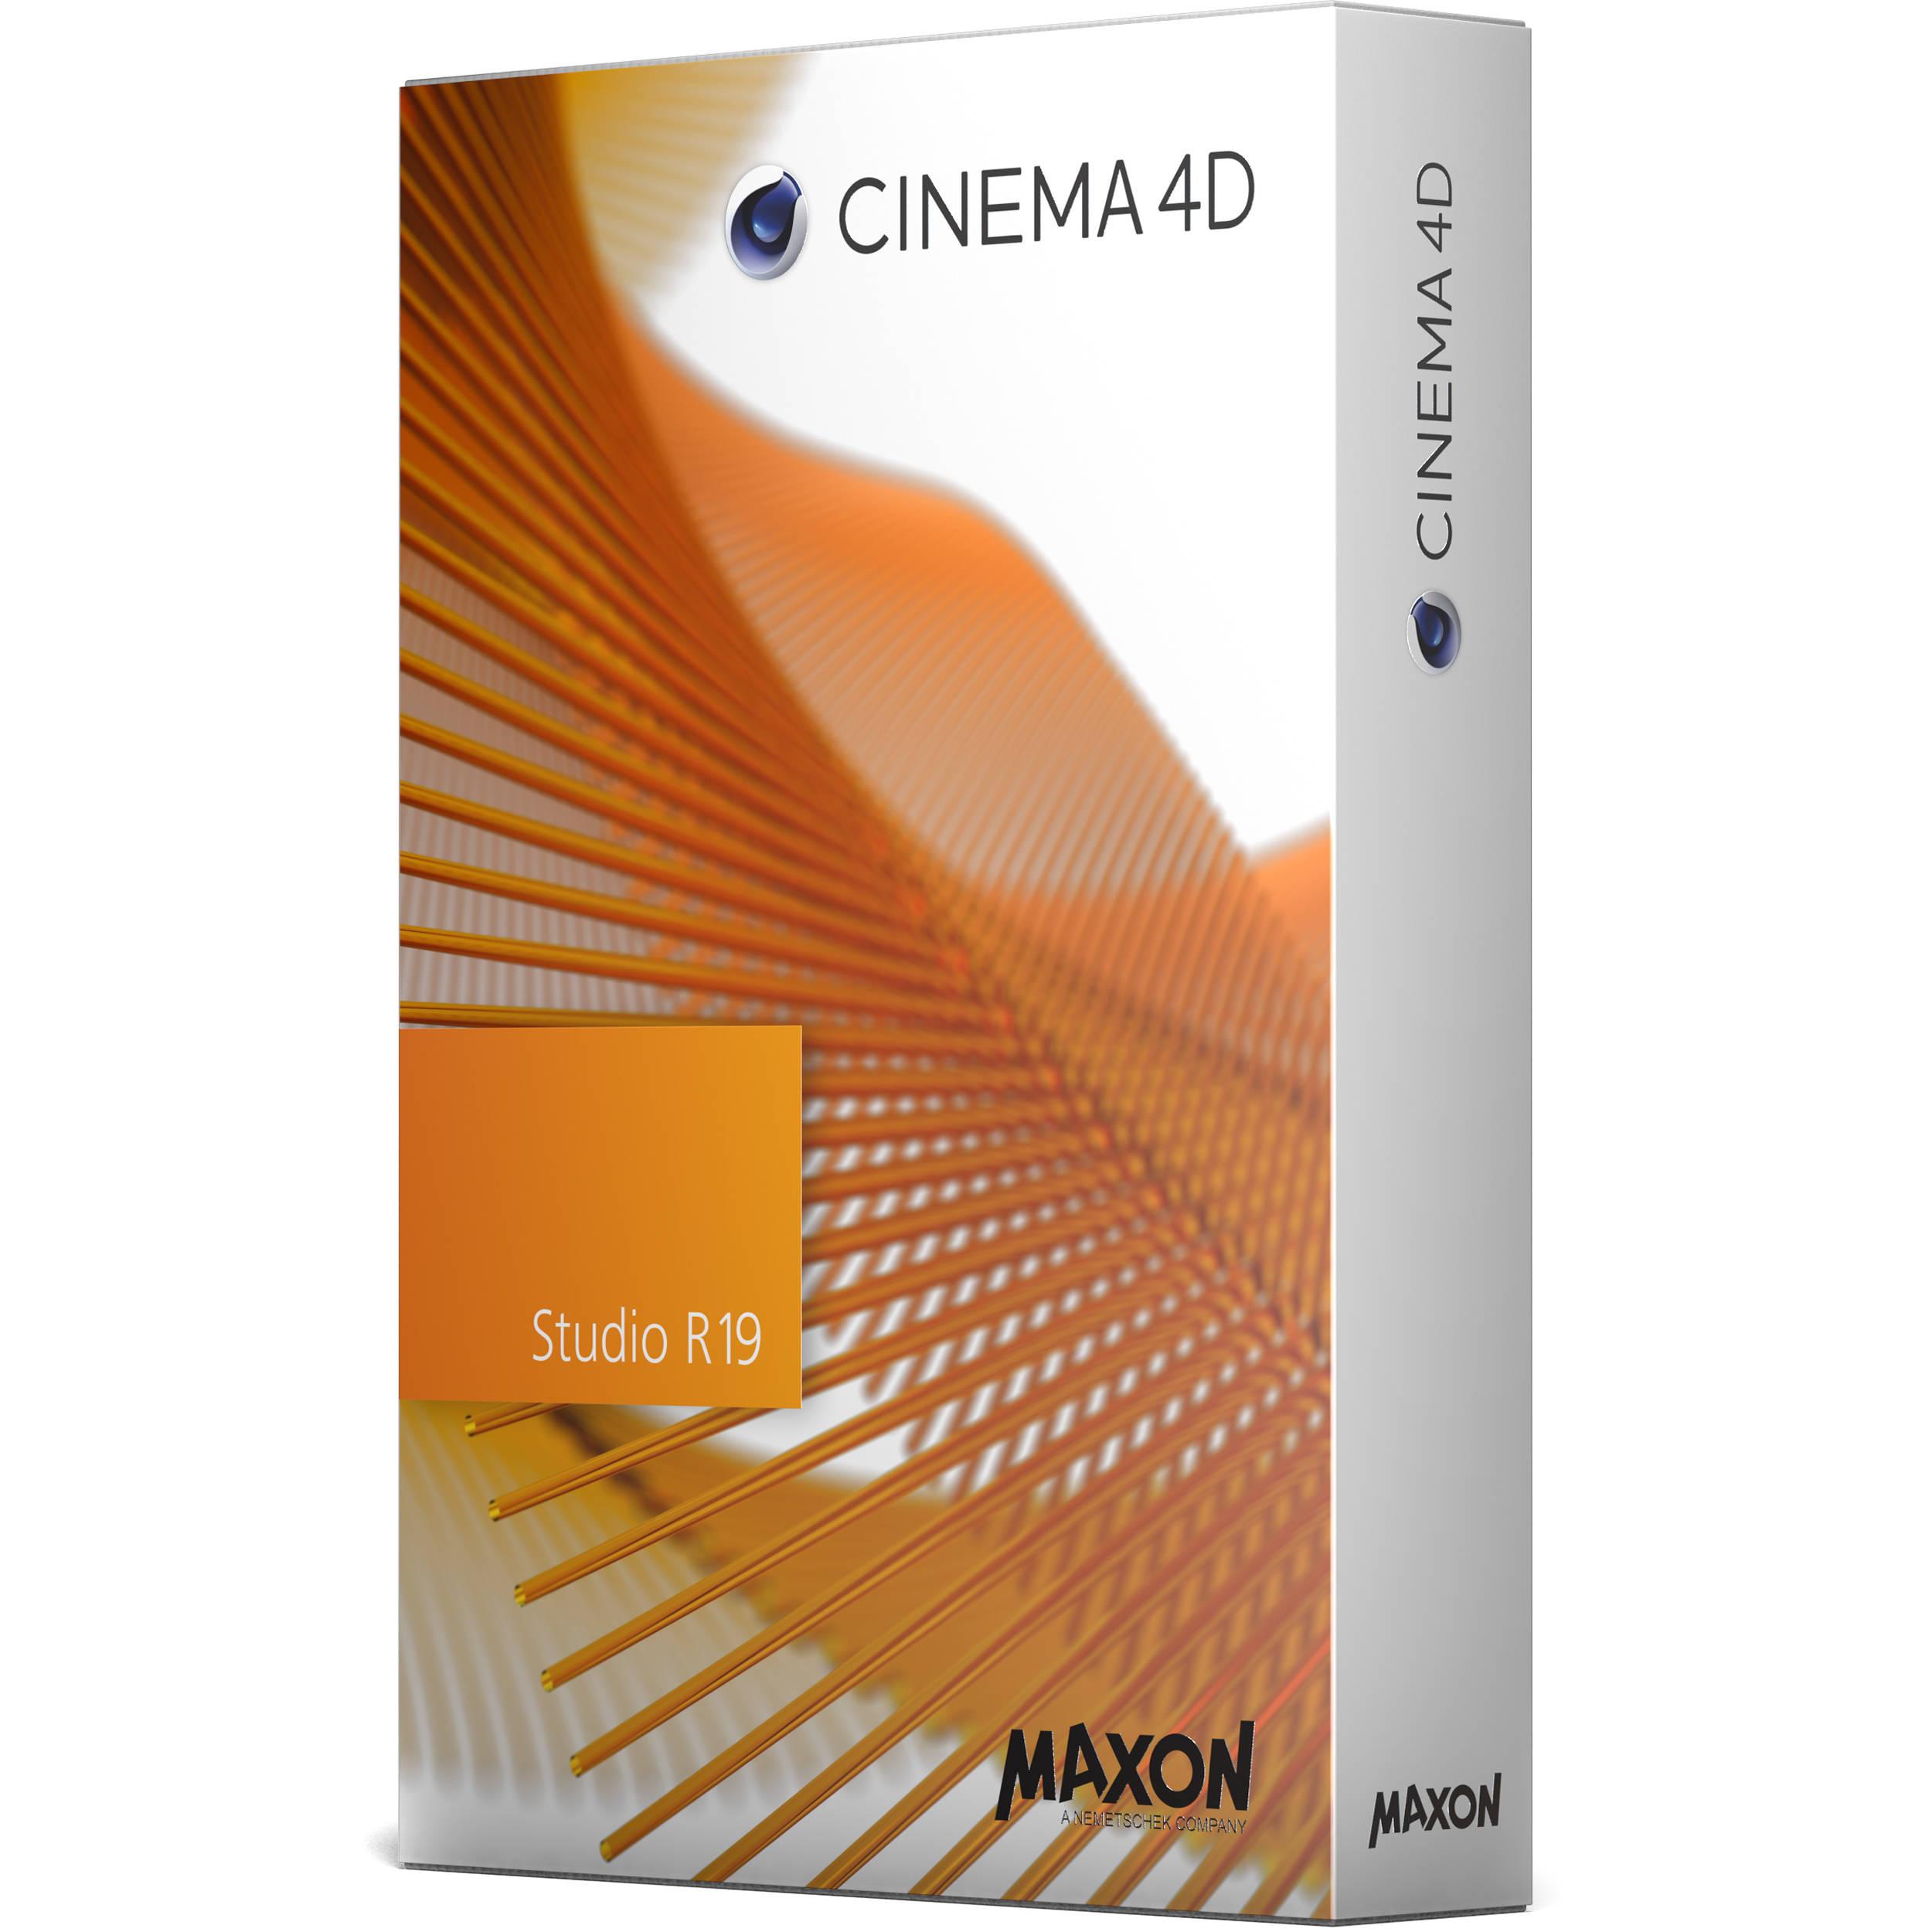 cinema 4d studio r19 full download